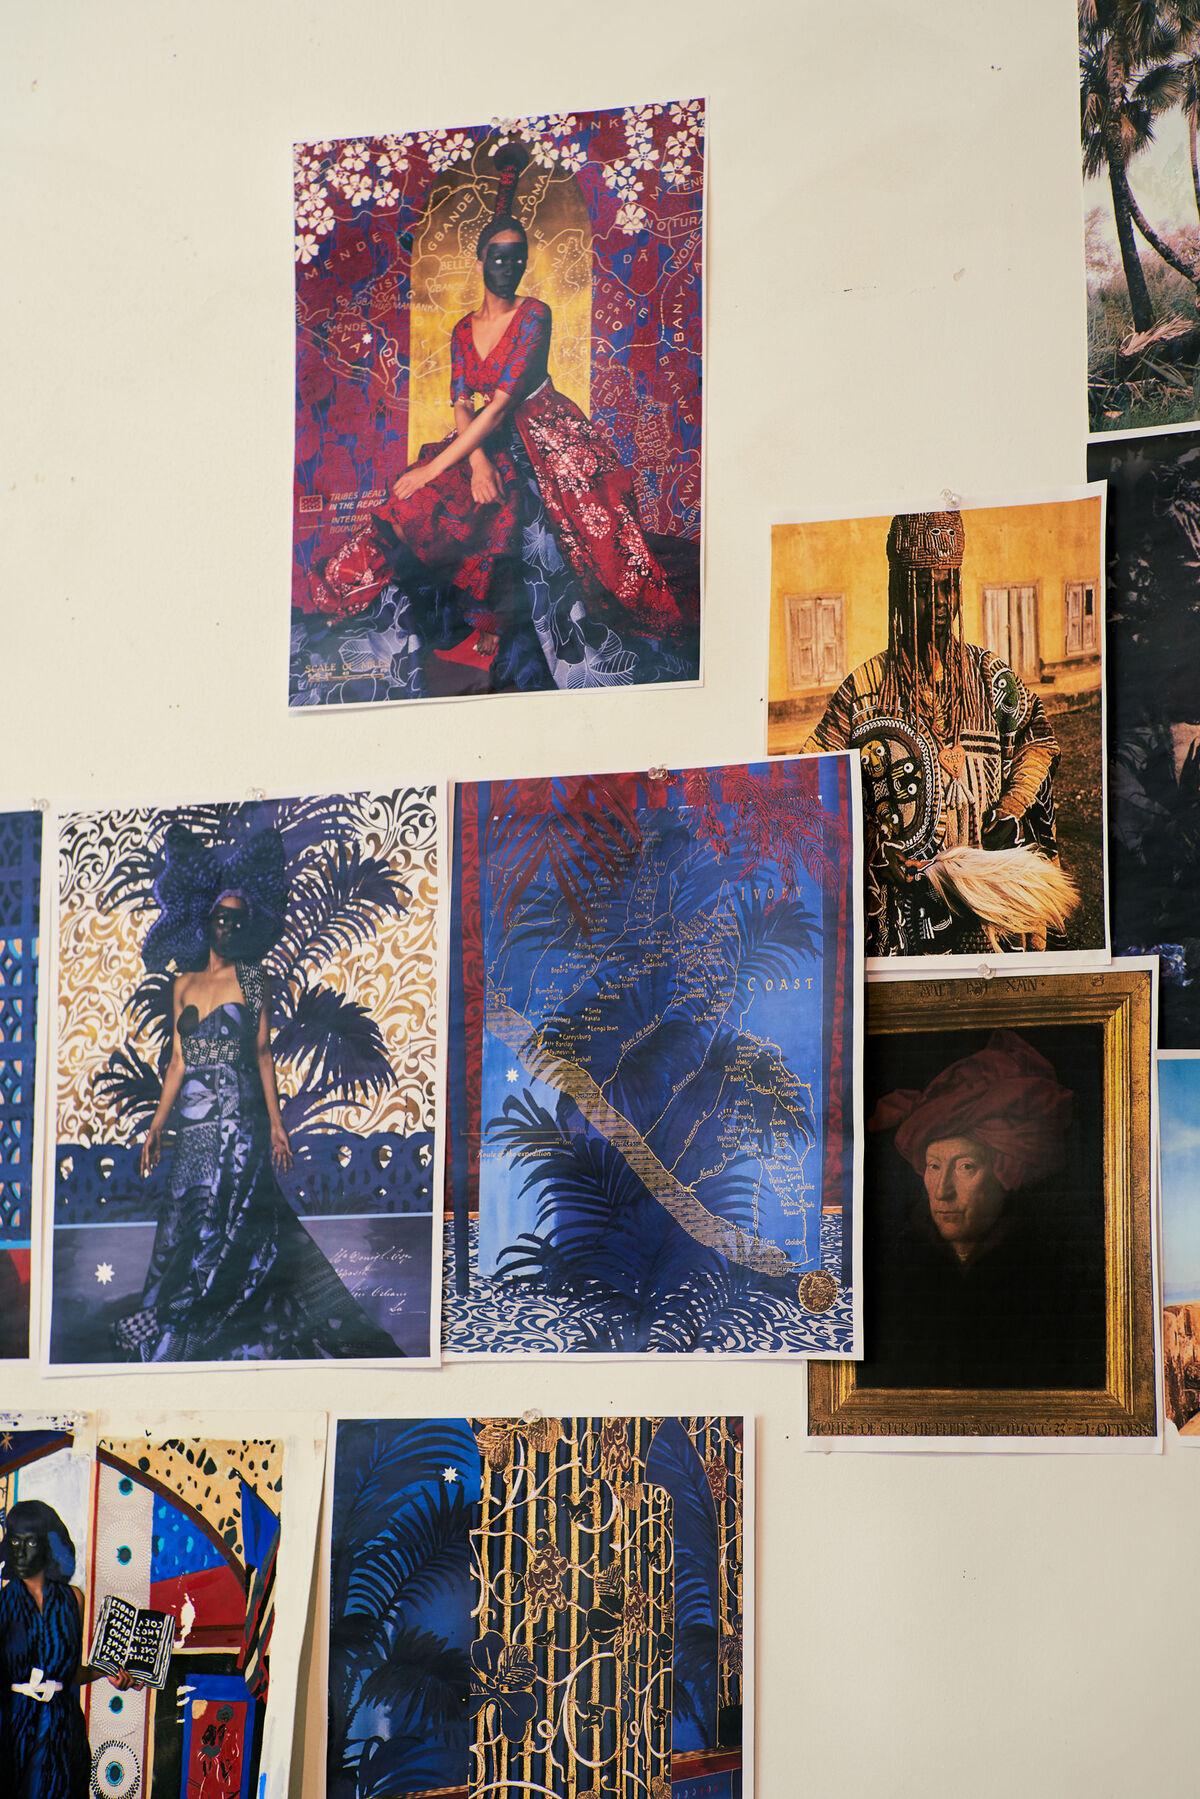 A view of Lina Iris Viktor's studio wall. Photo by Alex John Beck for Artsy.